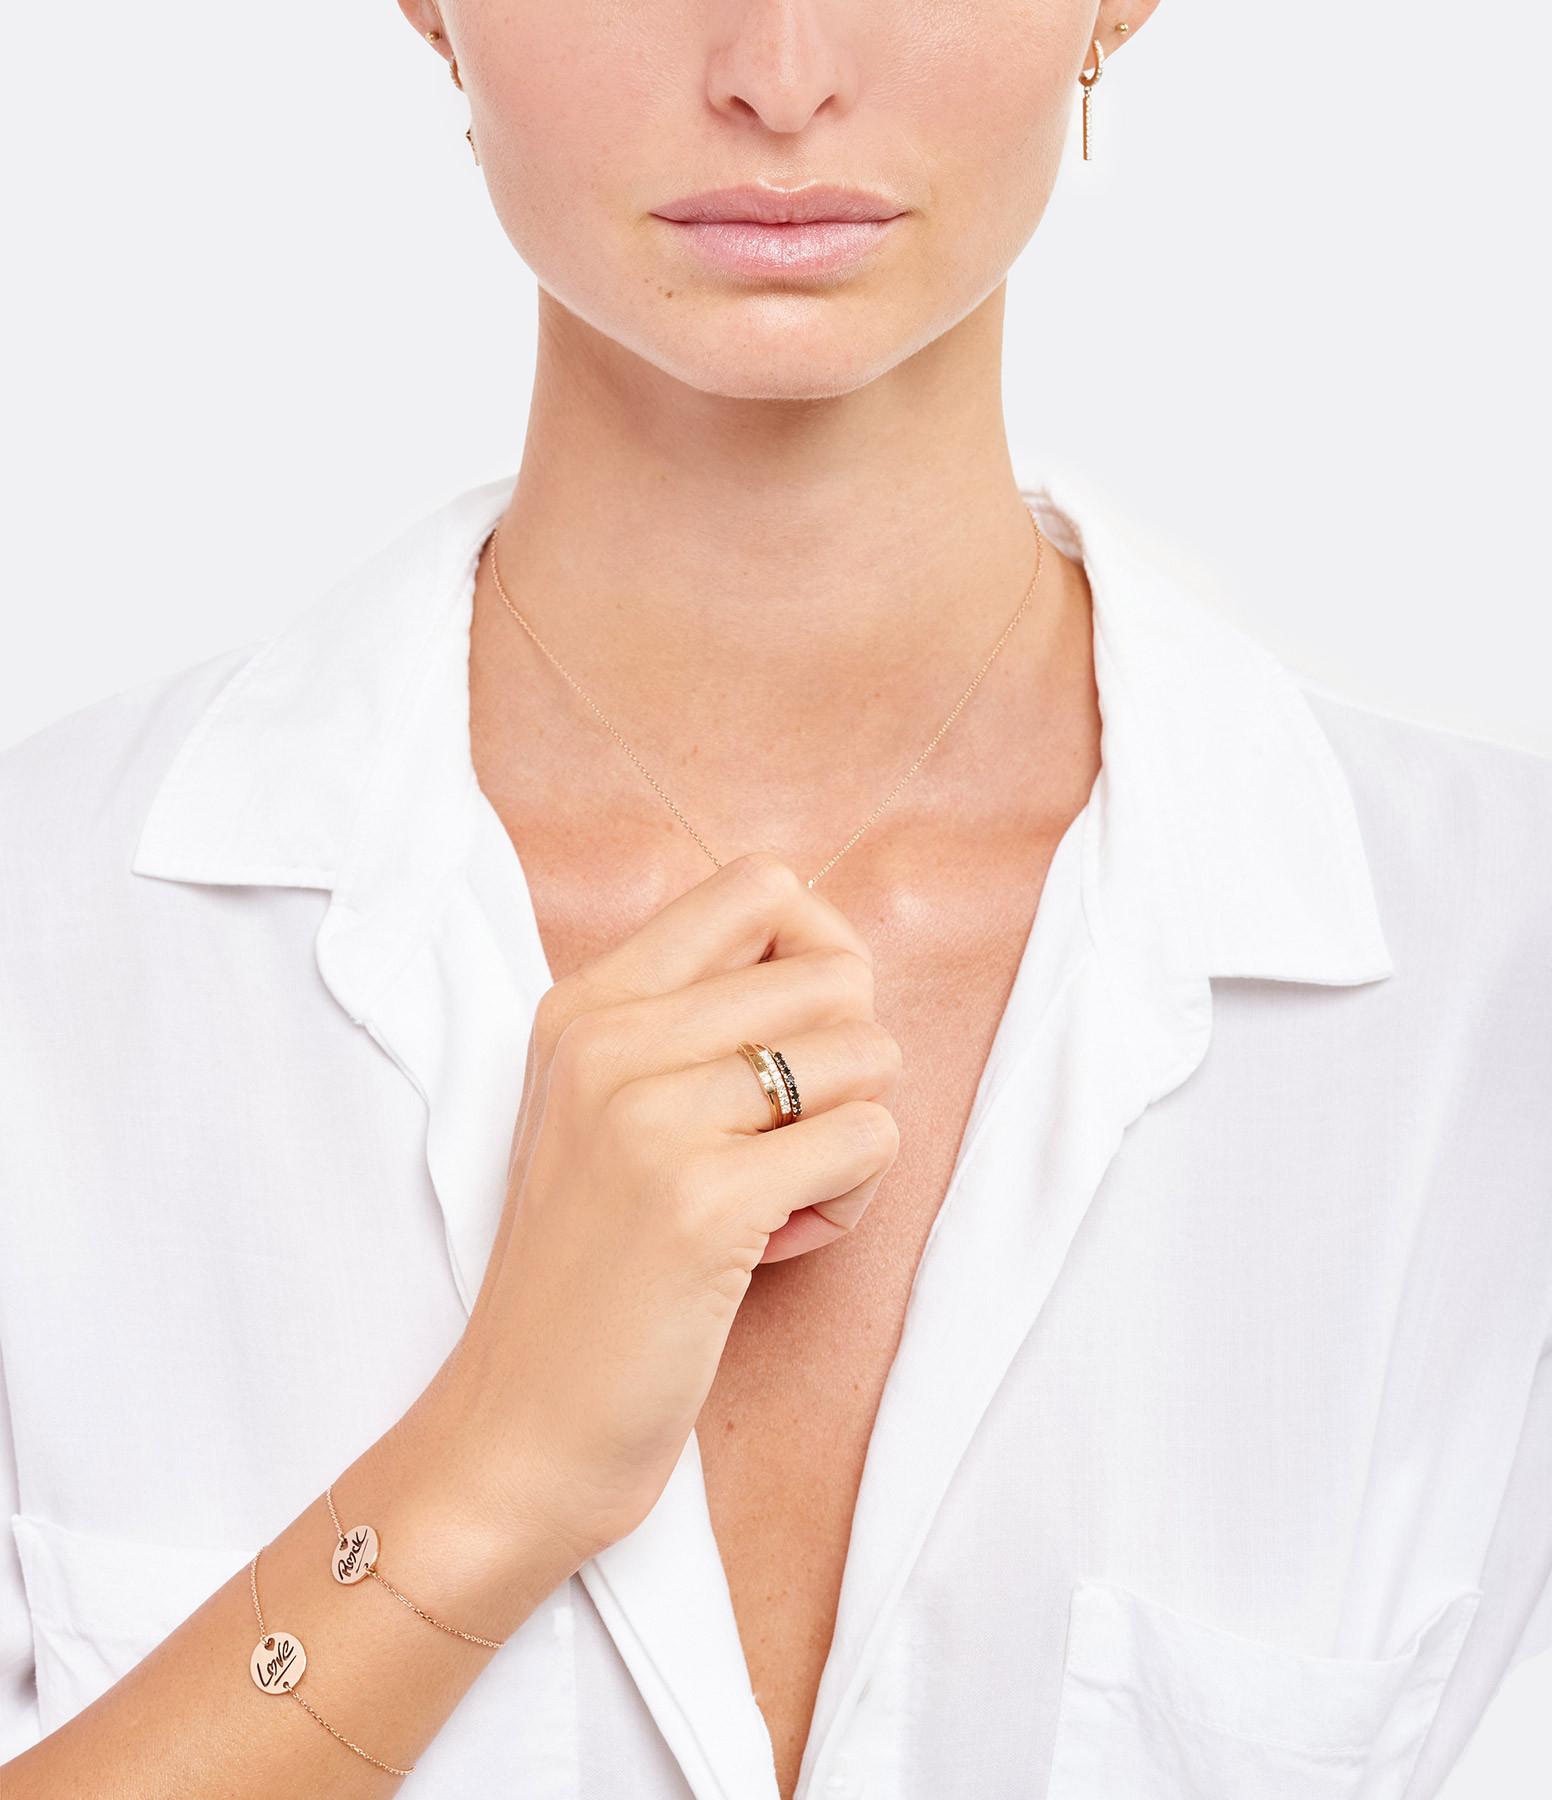 NAVA JOAILLERIE - Bague Demi-Alliance Hash Diamants Noirs Or Blanc